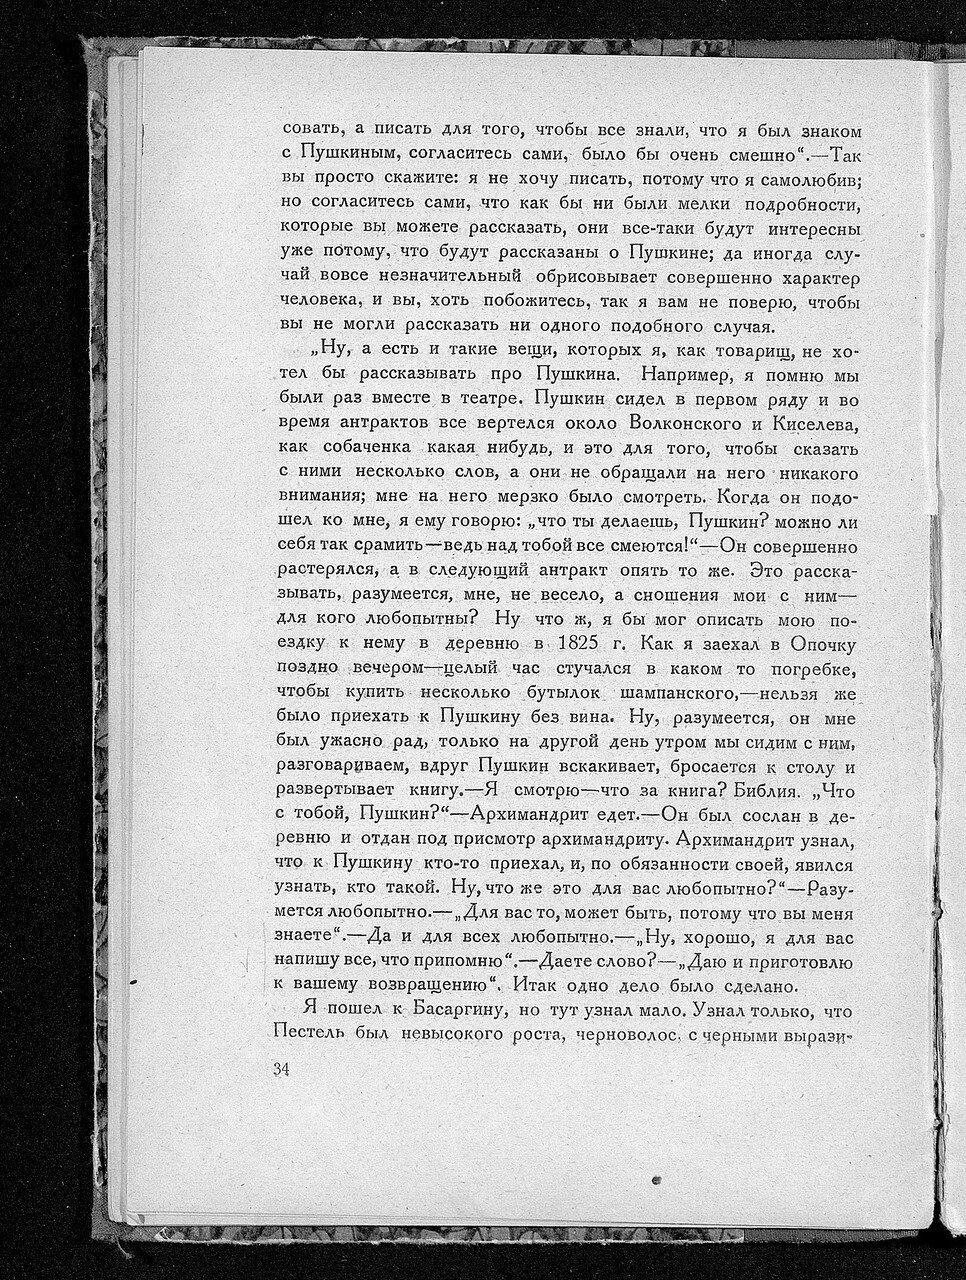 https://img-fotki.yandex.ru/get/875526/199368979.a0/0_21431b_71e2cb91_XXXL.jpg